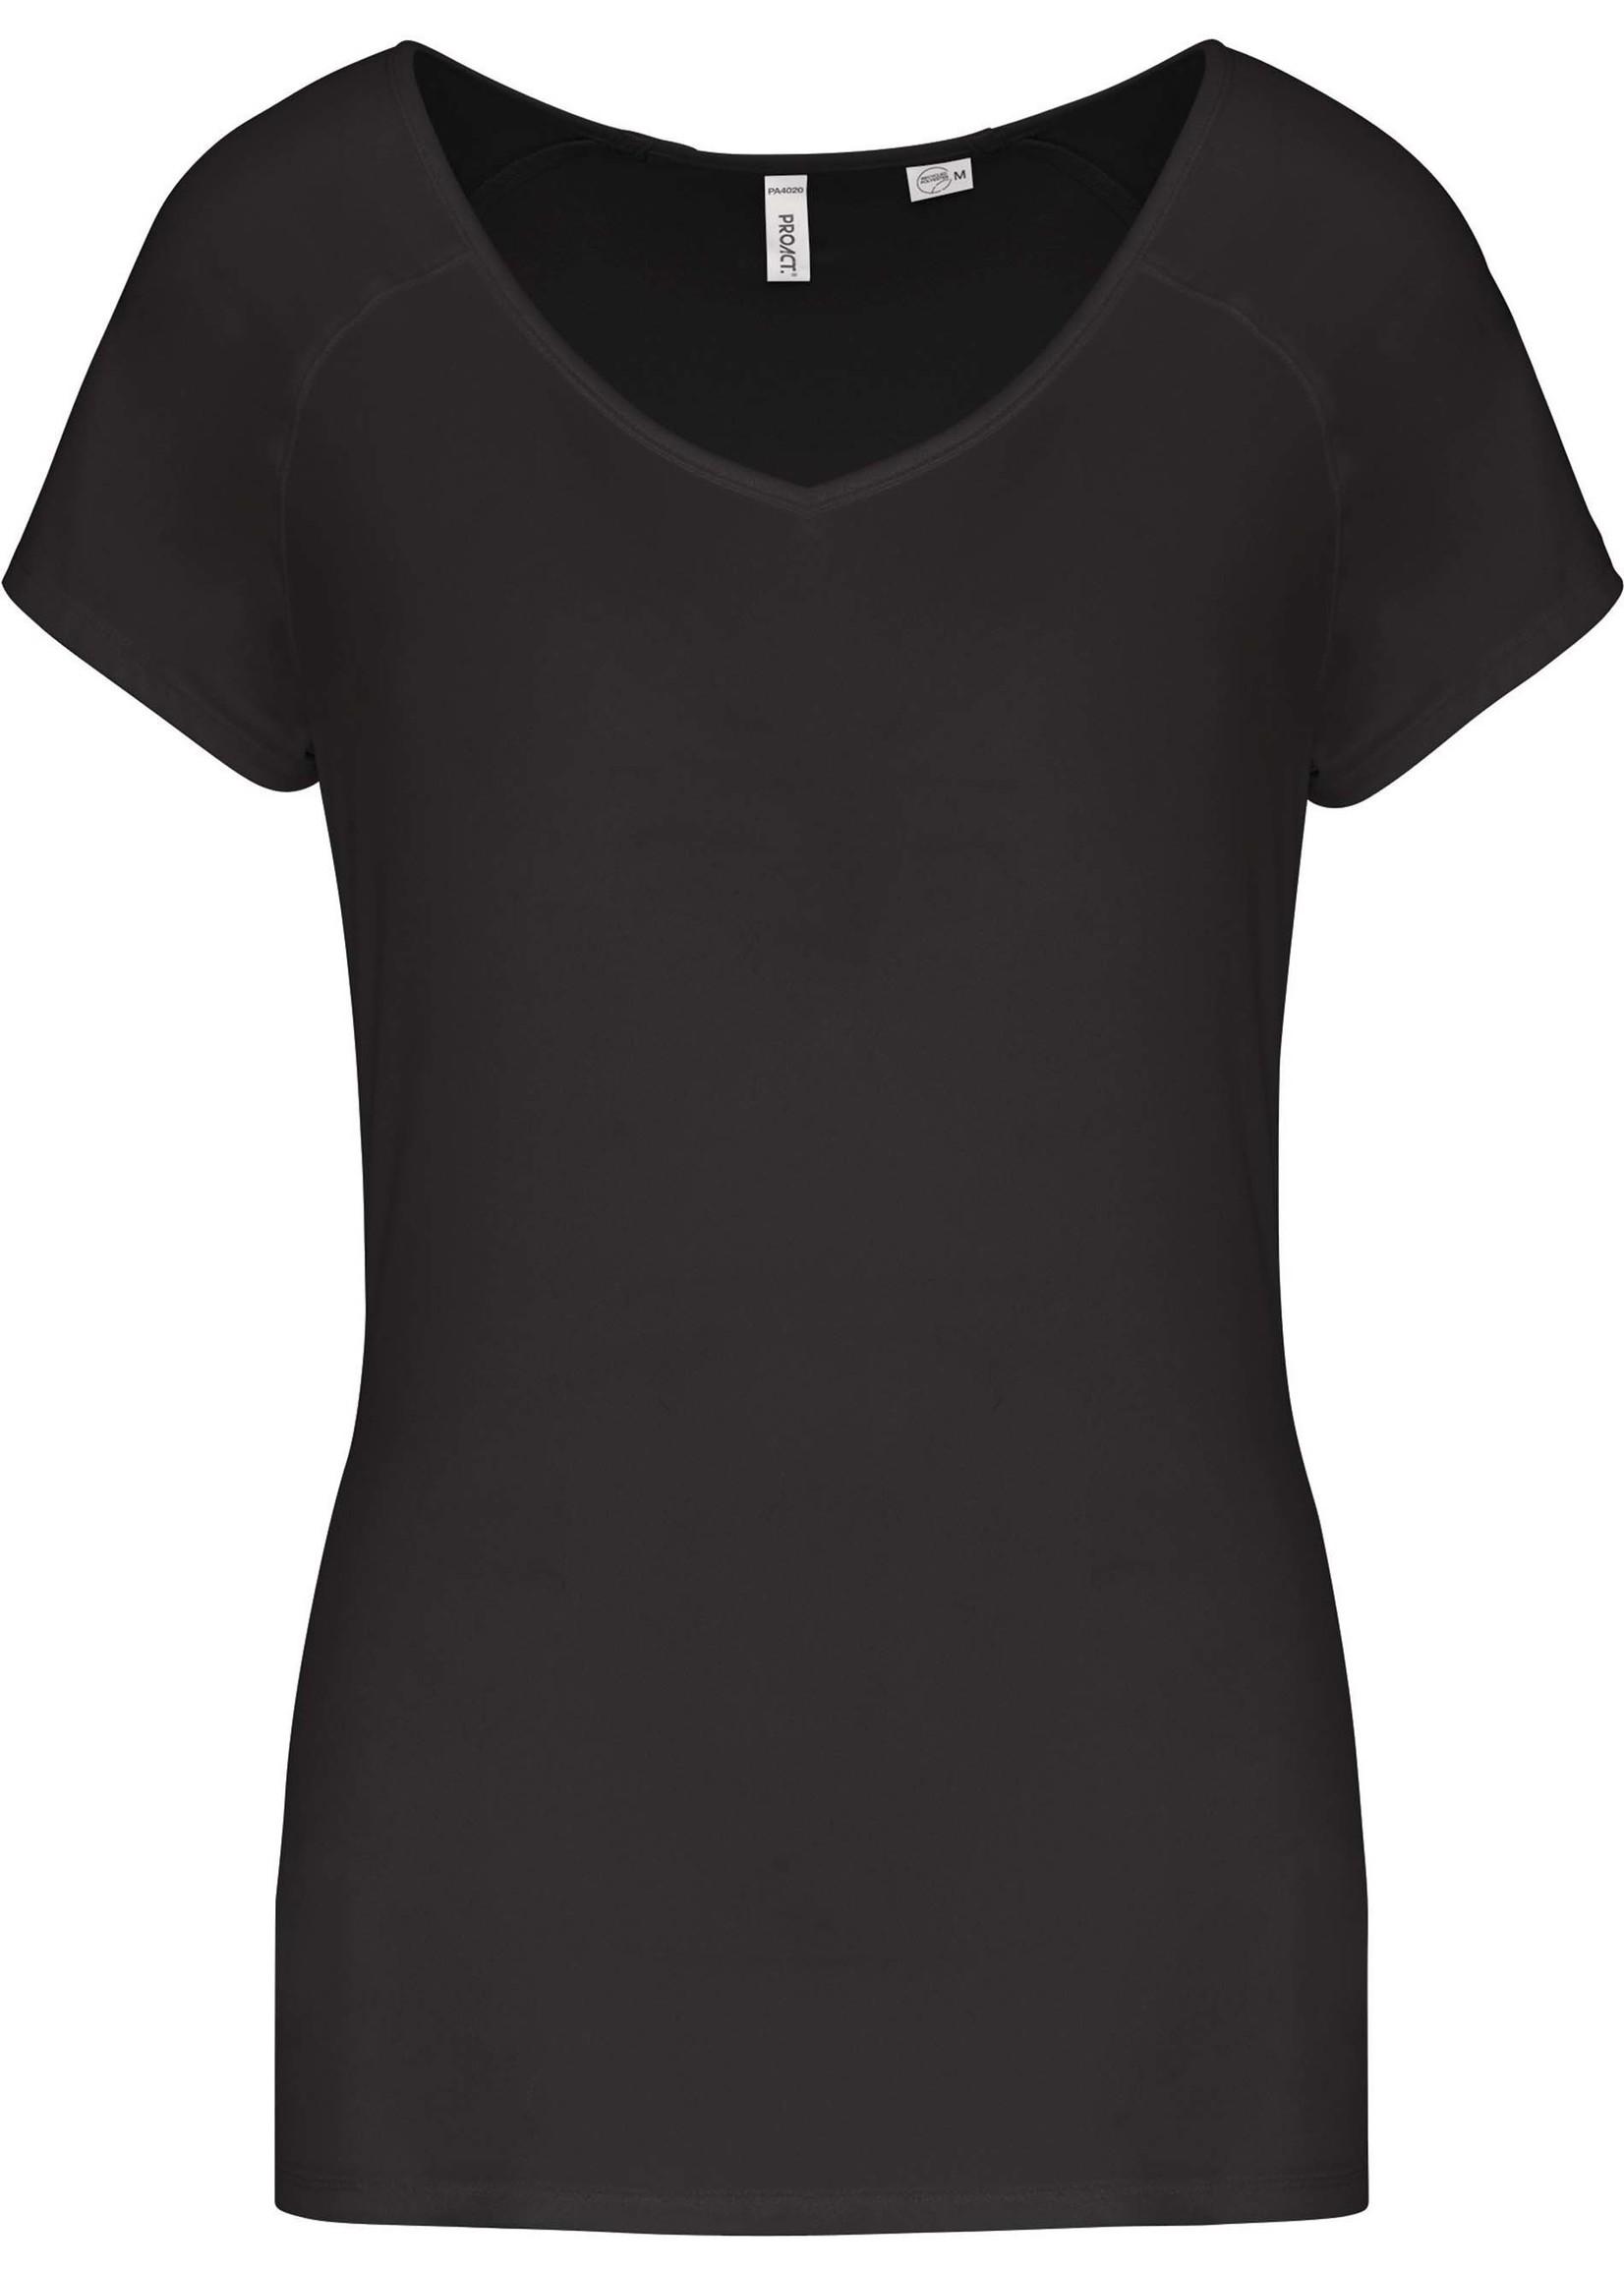 Eco-Friendly Sportshirt Sportiva Donna  Black